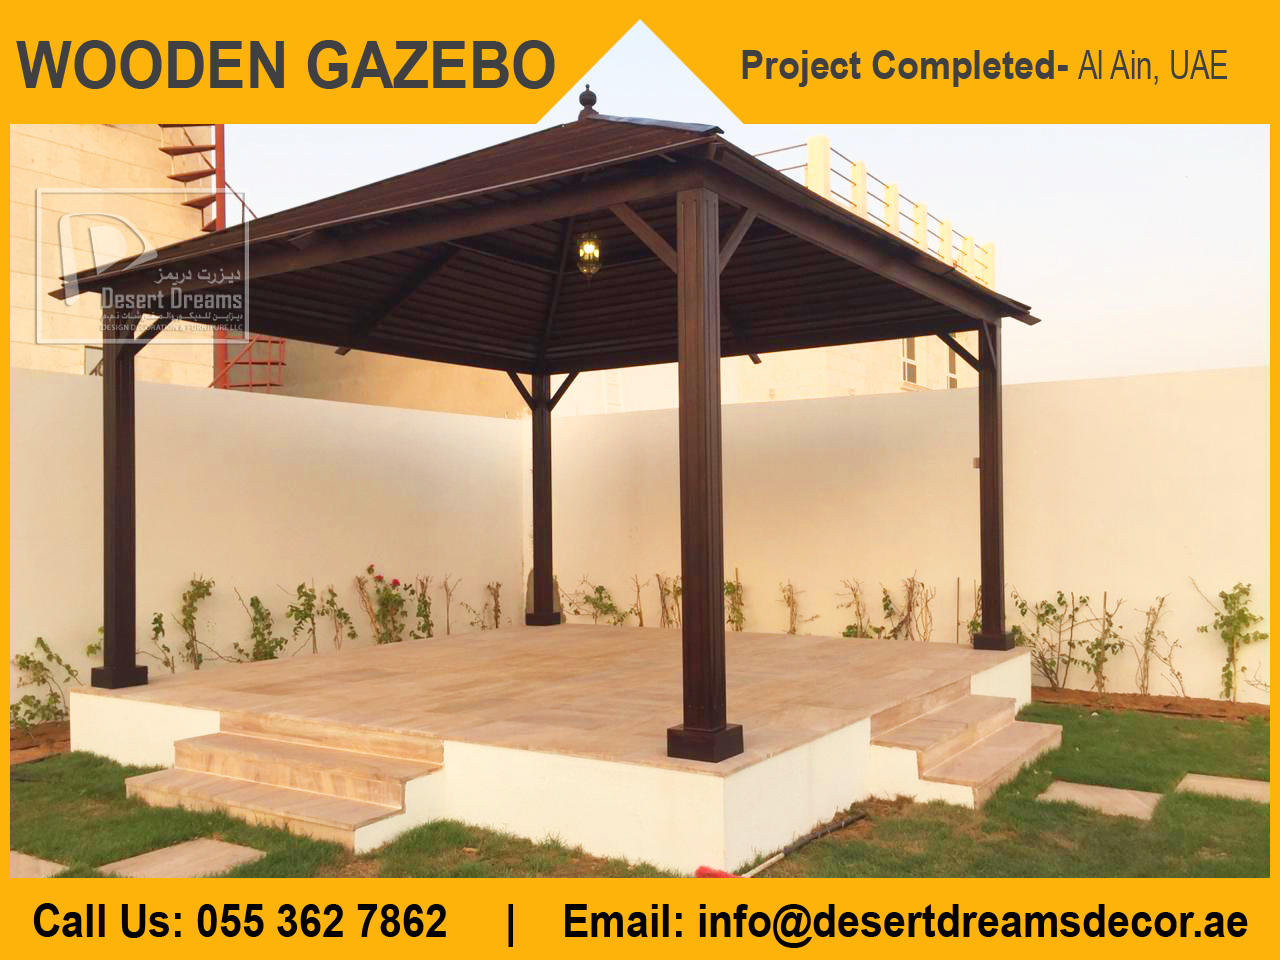 Wooden Gazebo Manufacturing and Installing in UAE_Wooden Gazebo Images_Desert Dreams (1).jpg